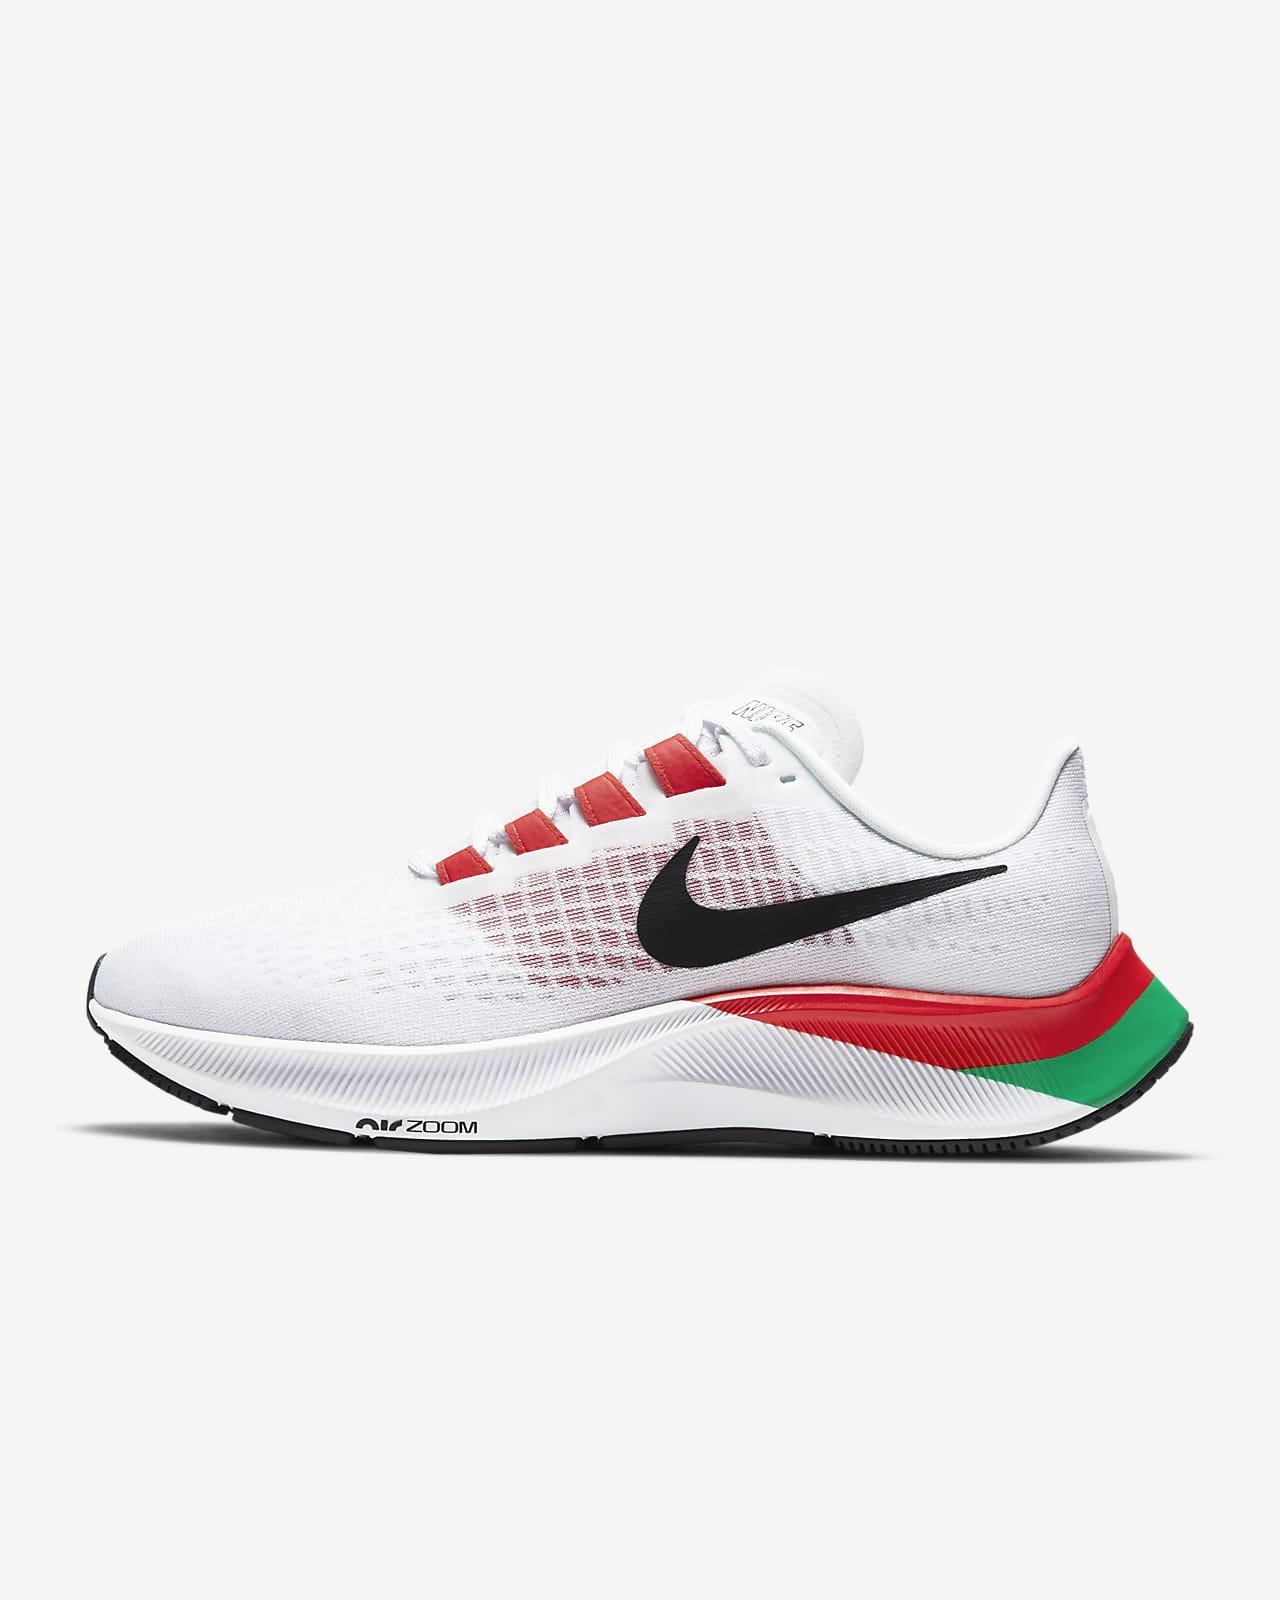 Calzado de running para mujer Nike Air Zoom Pegasus 37 Eliud Kipchoge